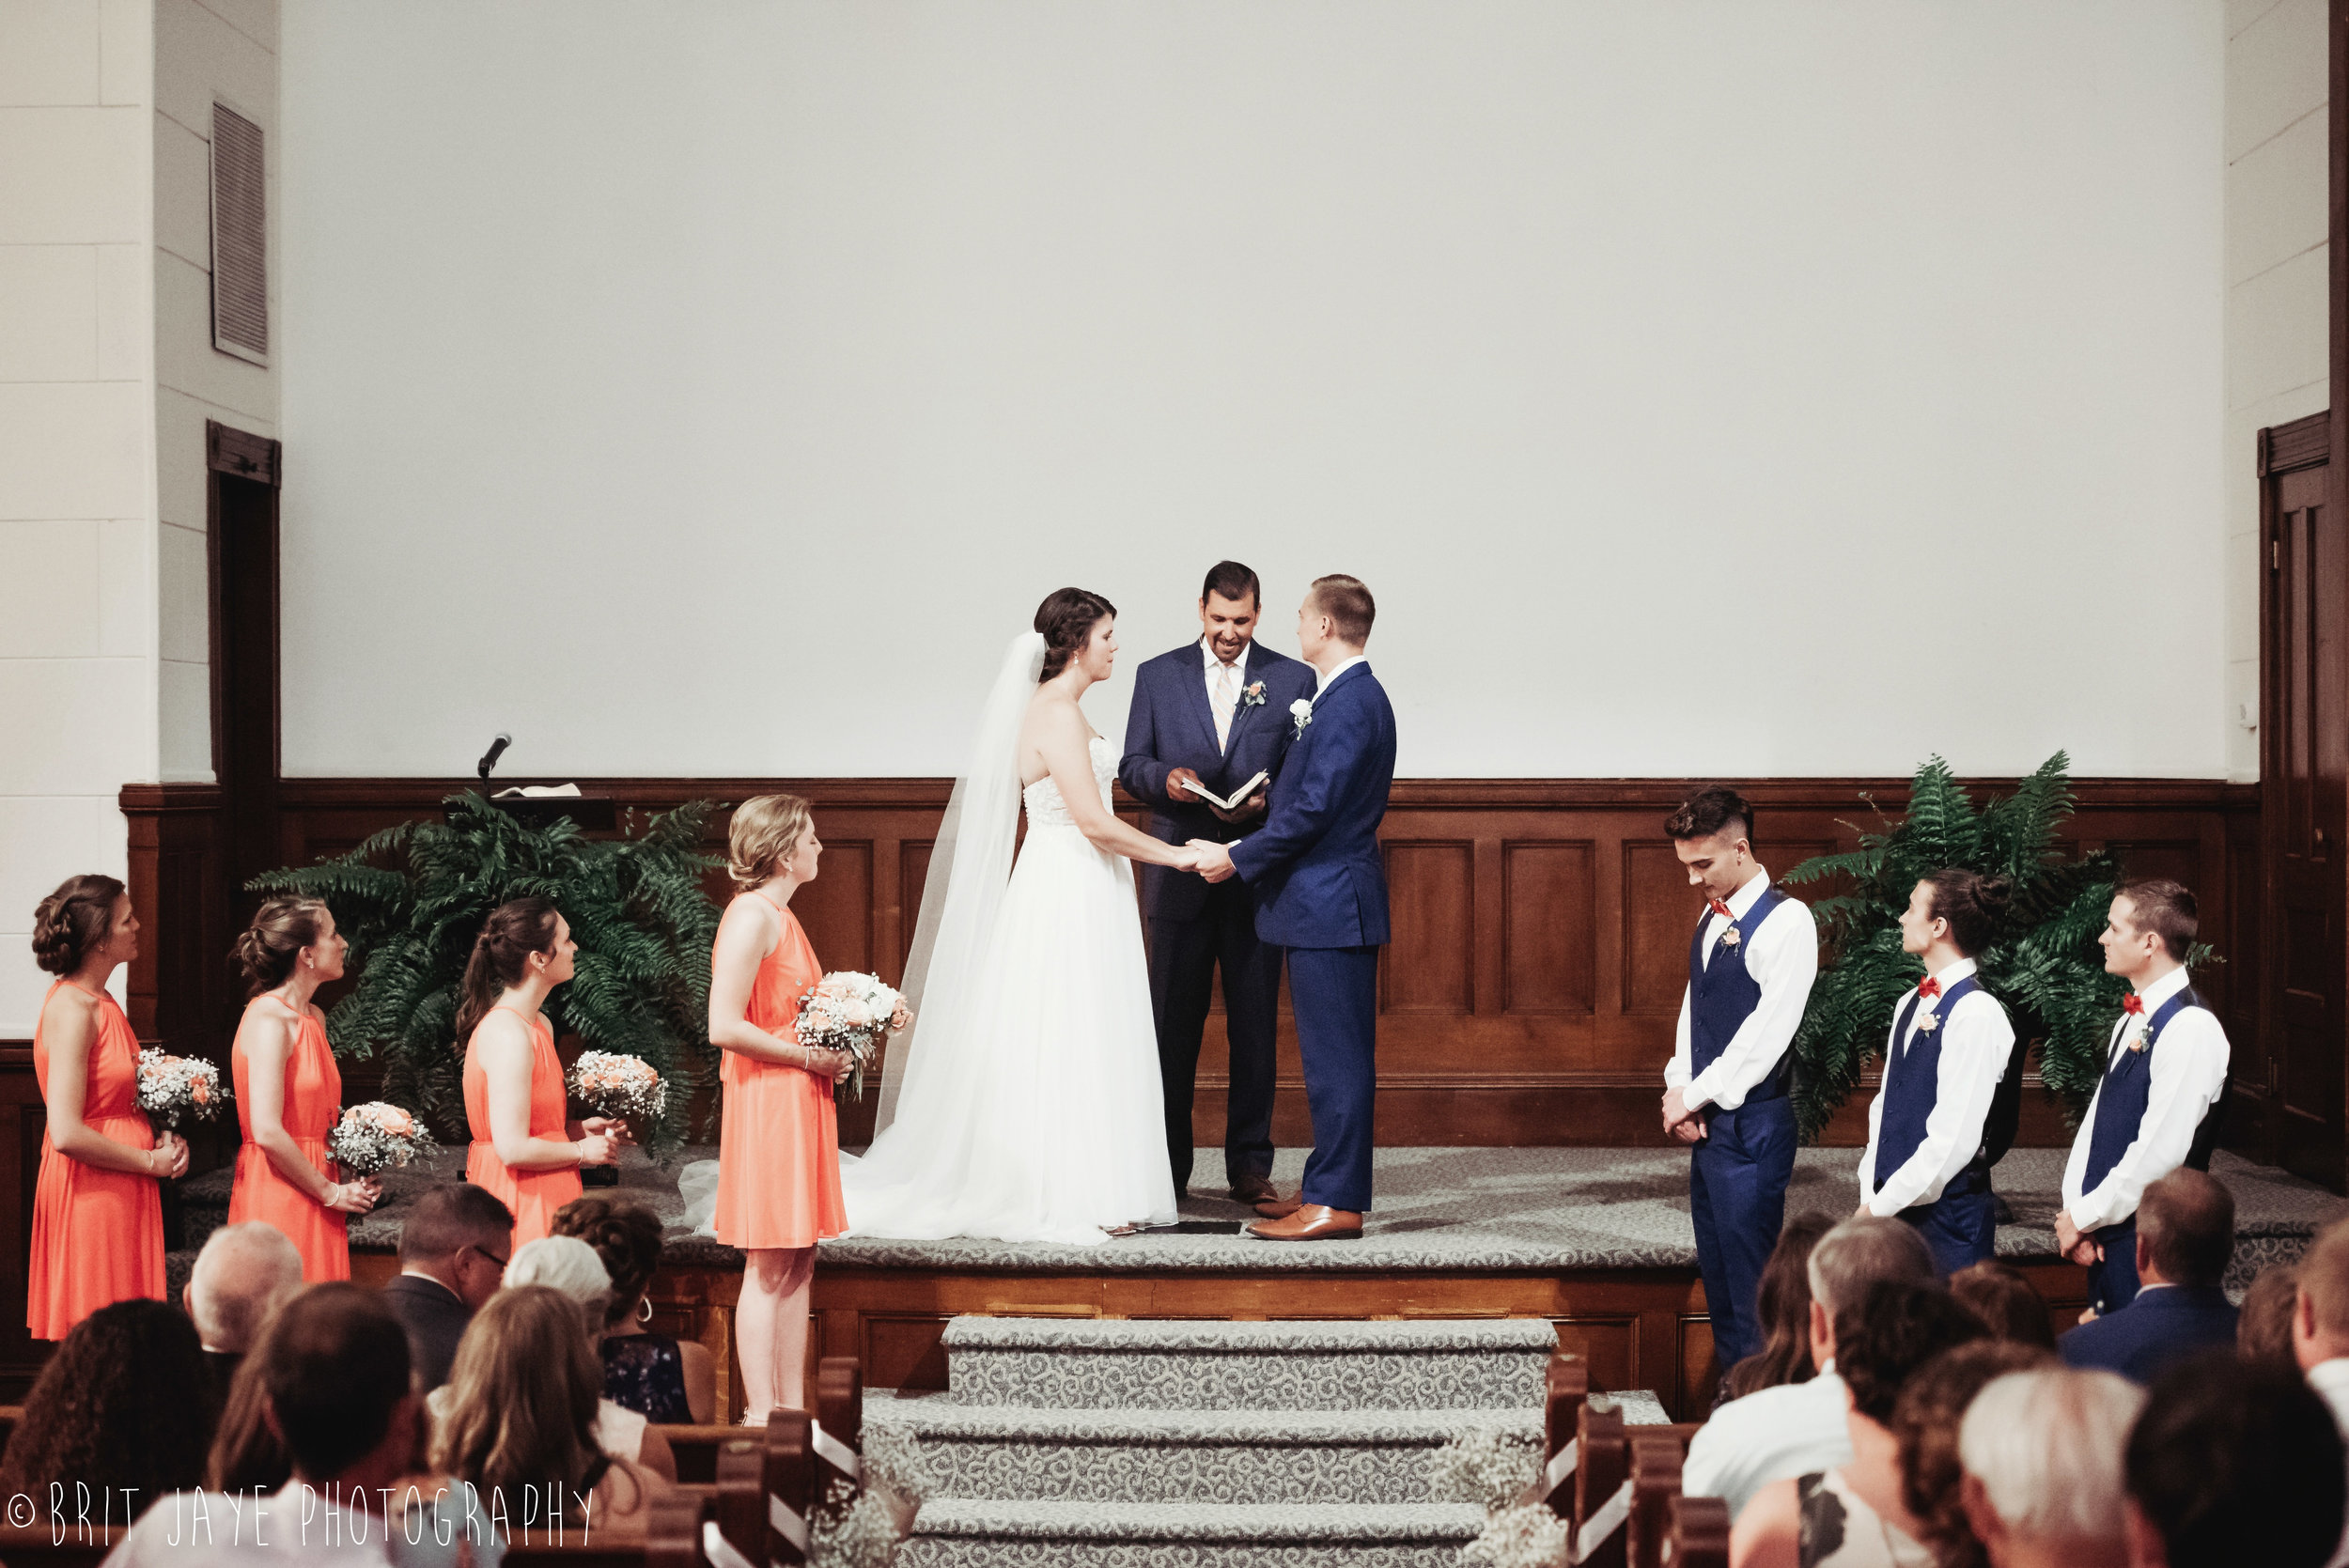 Champaign_aviation_museum_travel_inspired_wedding-4.jpg